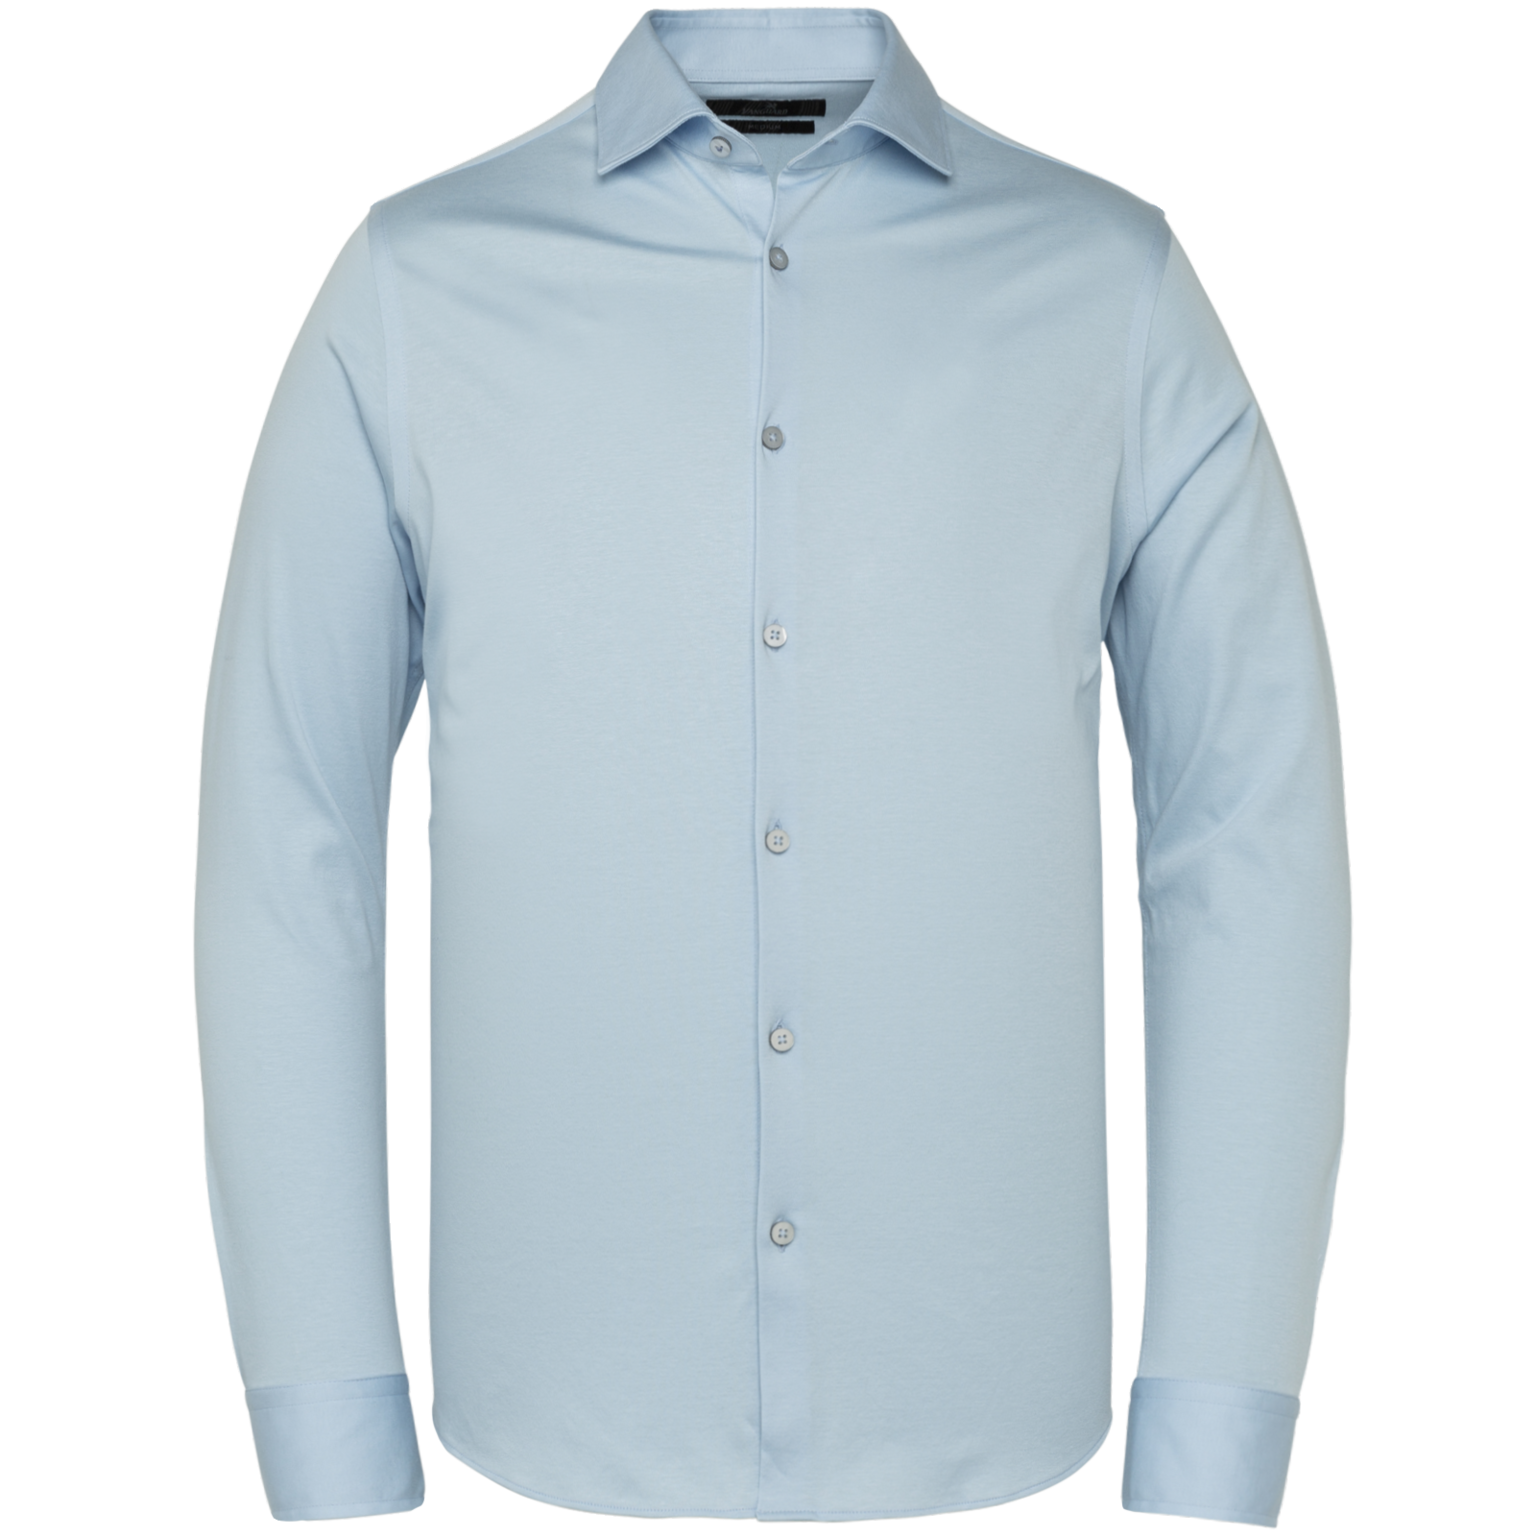 VANGUARD chemise longues manches jersey-3